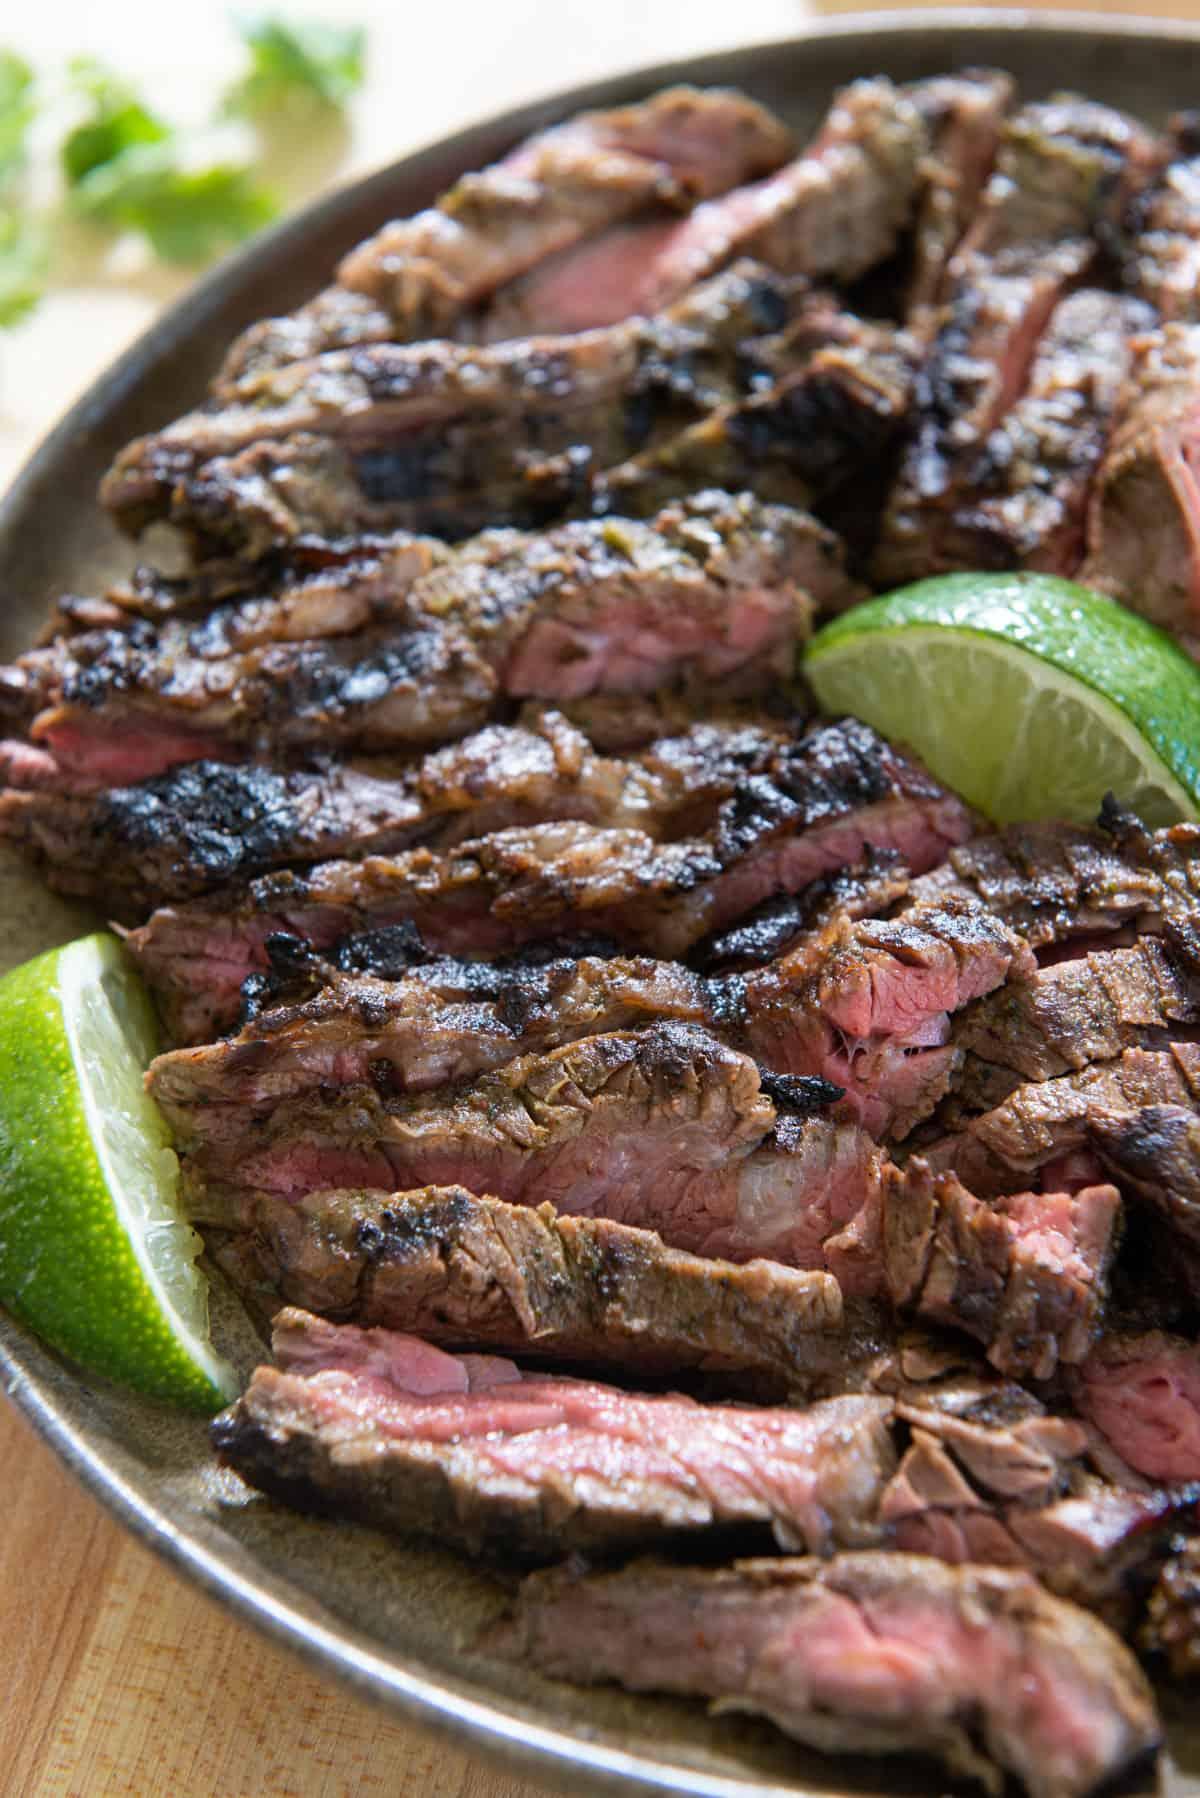 Sliced Carne Asada Skirt Steak Beef on Plate with LImes